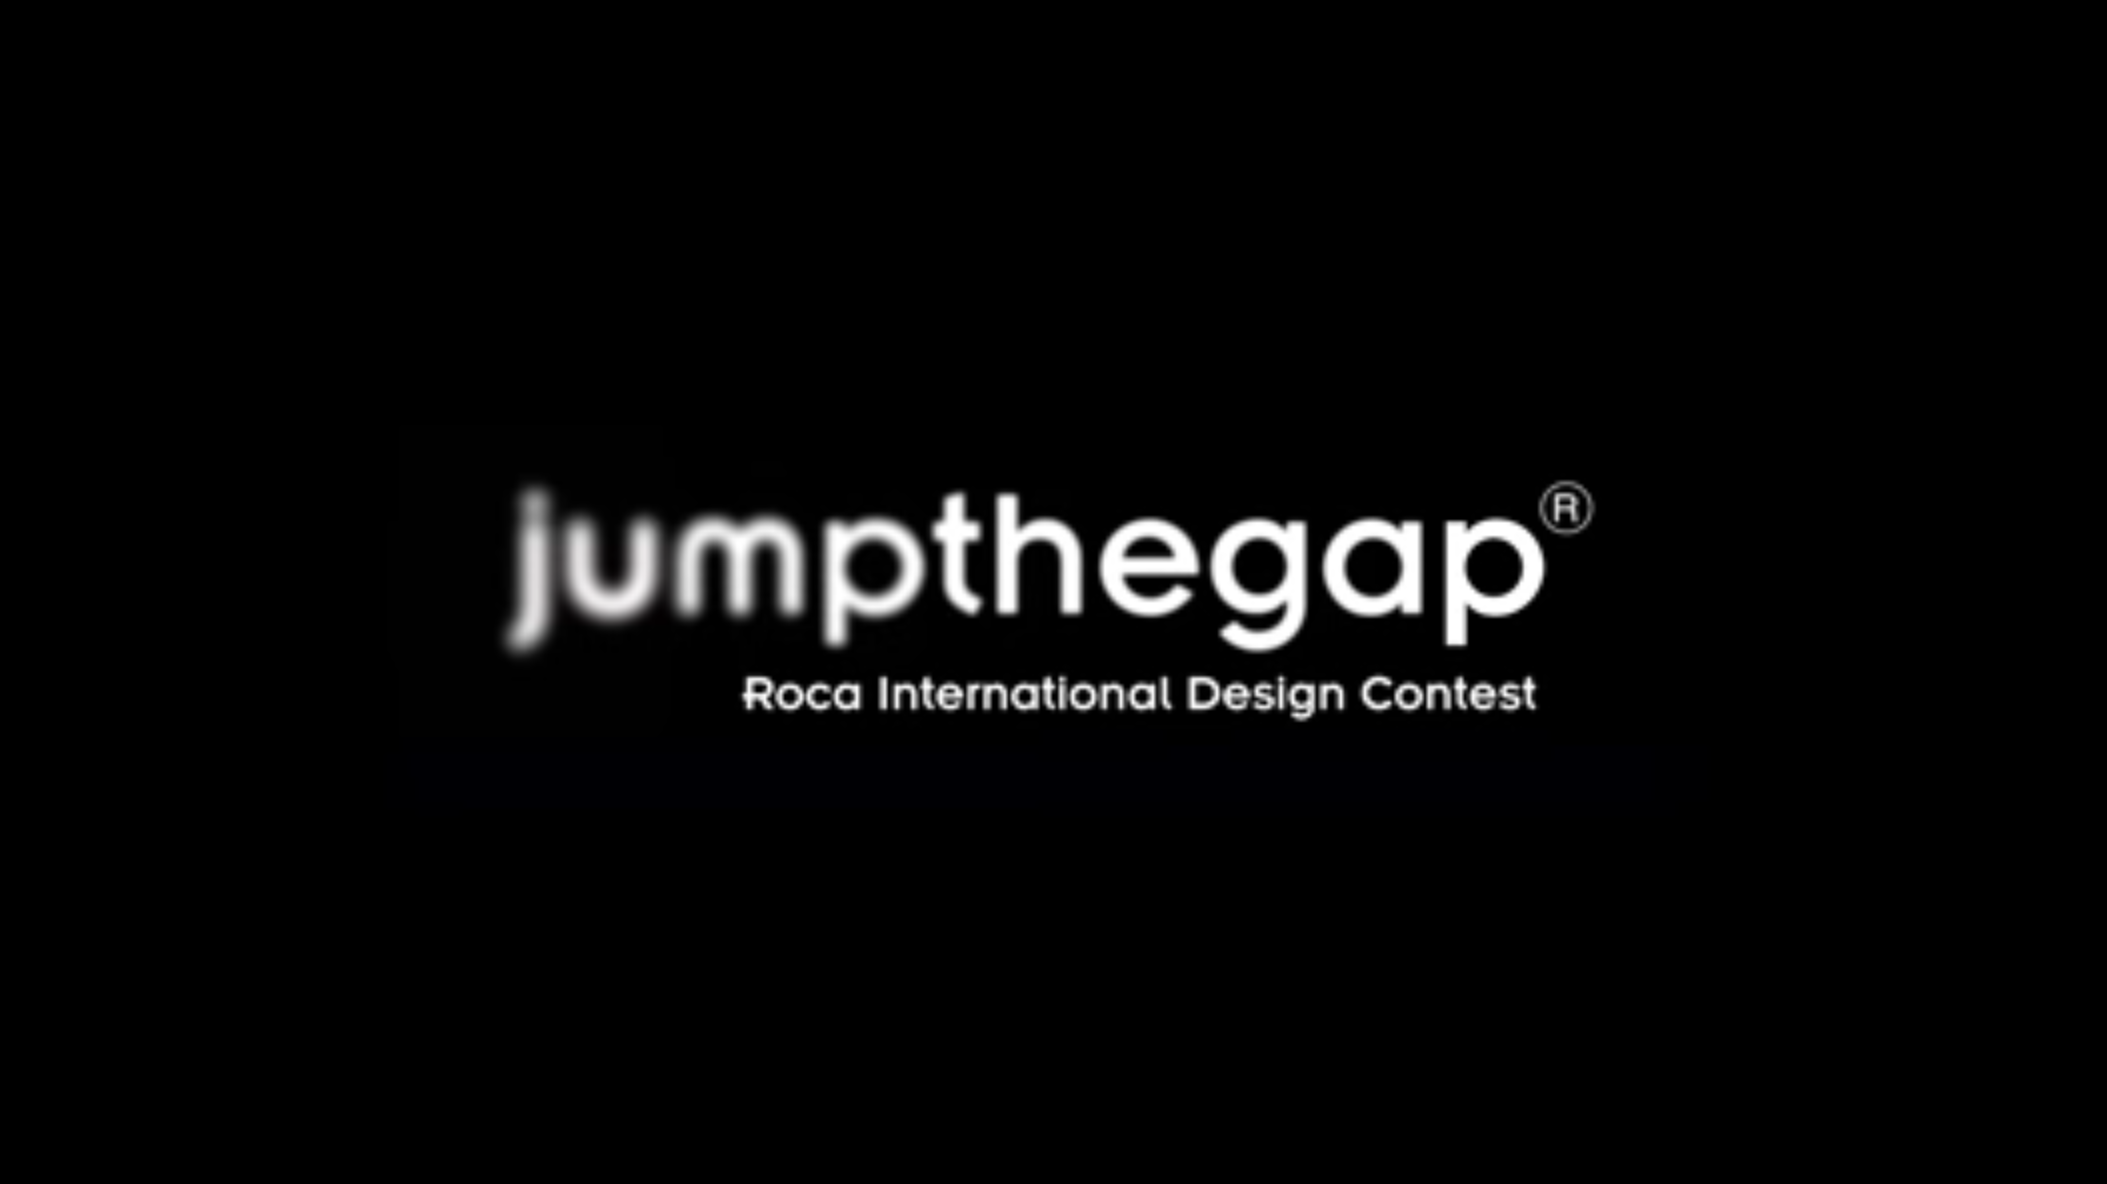 Jump the gap by Roca